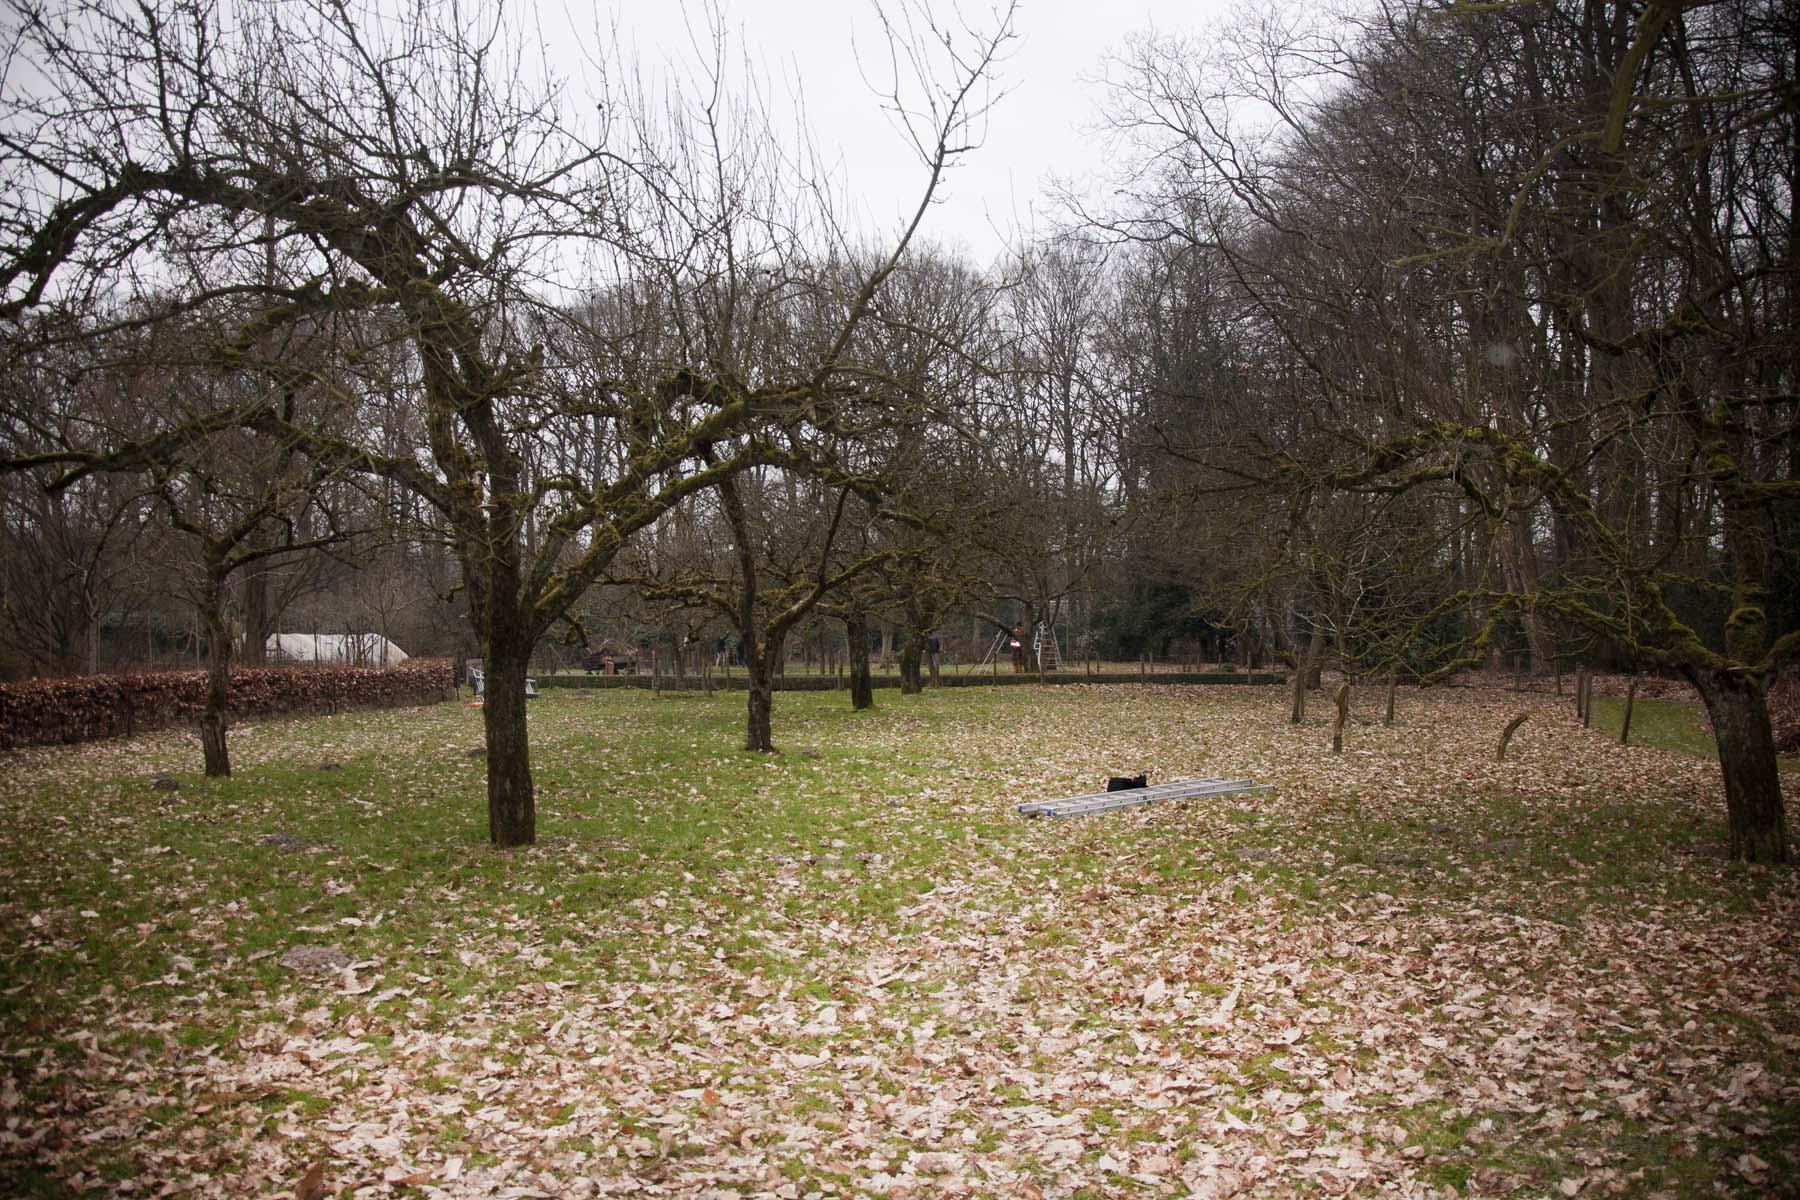 201-02-23-hsb-vollenhove-4514